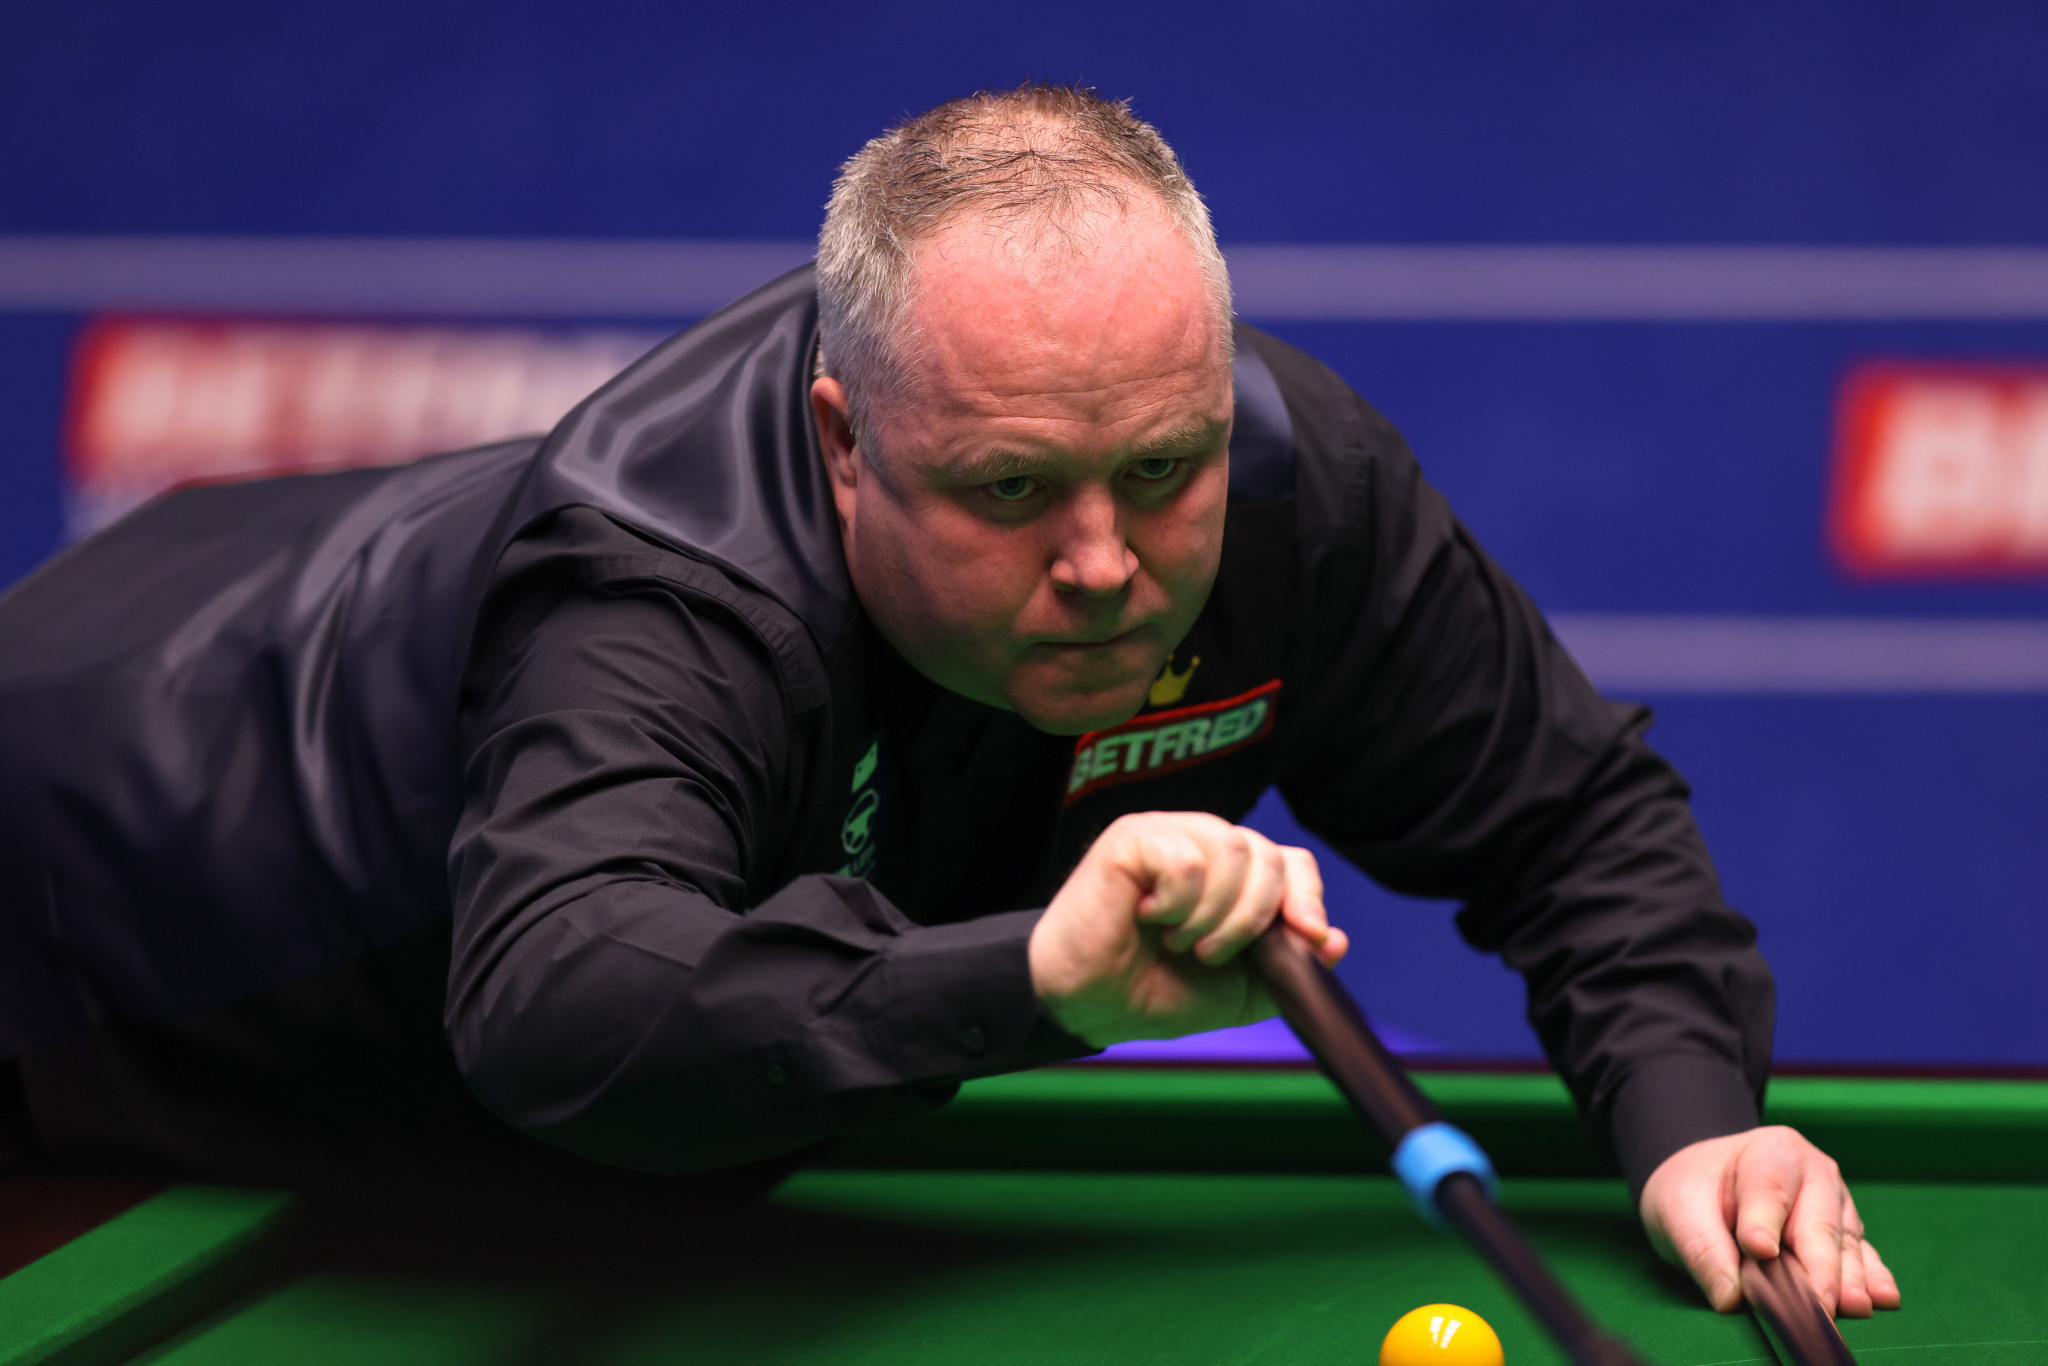 Four-time champion Higgins battles back to advance at World Snooker Championship